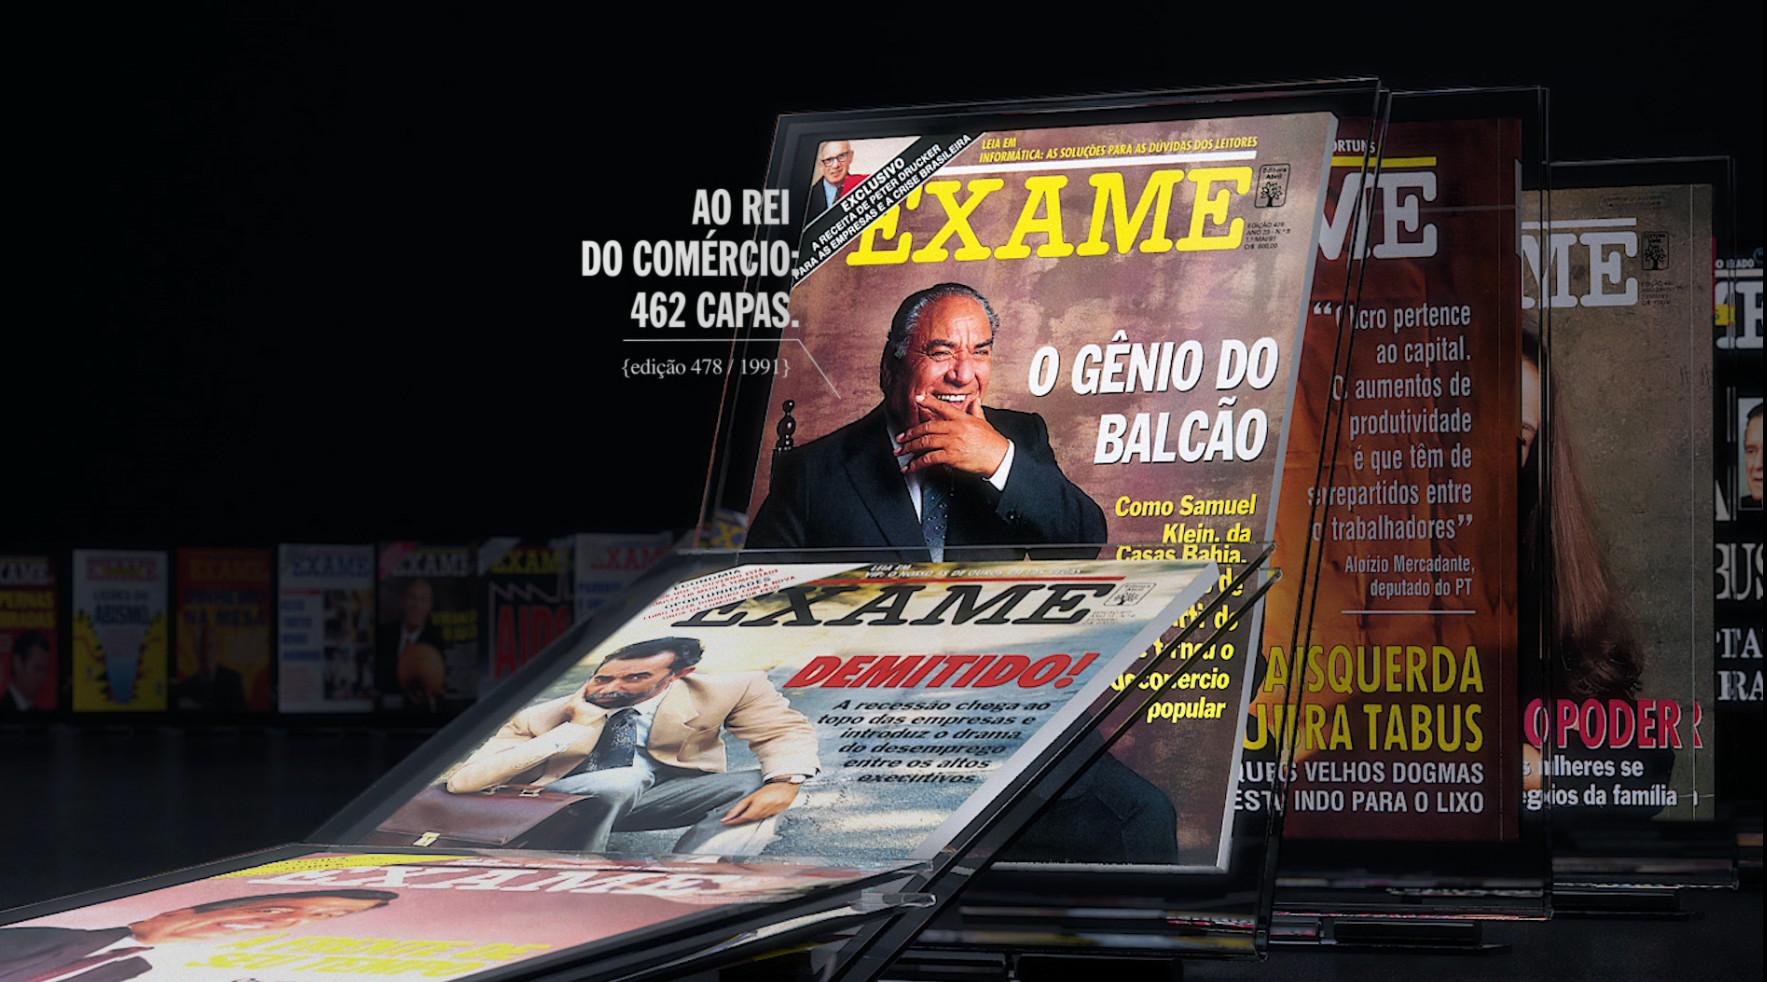 EXAME Magazine (Advertising)